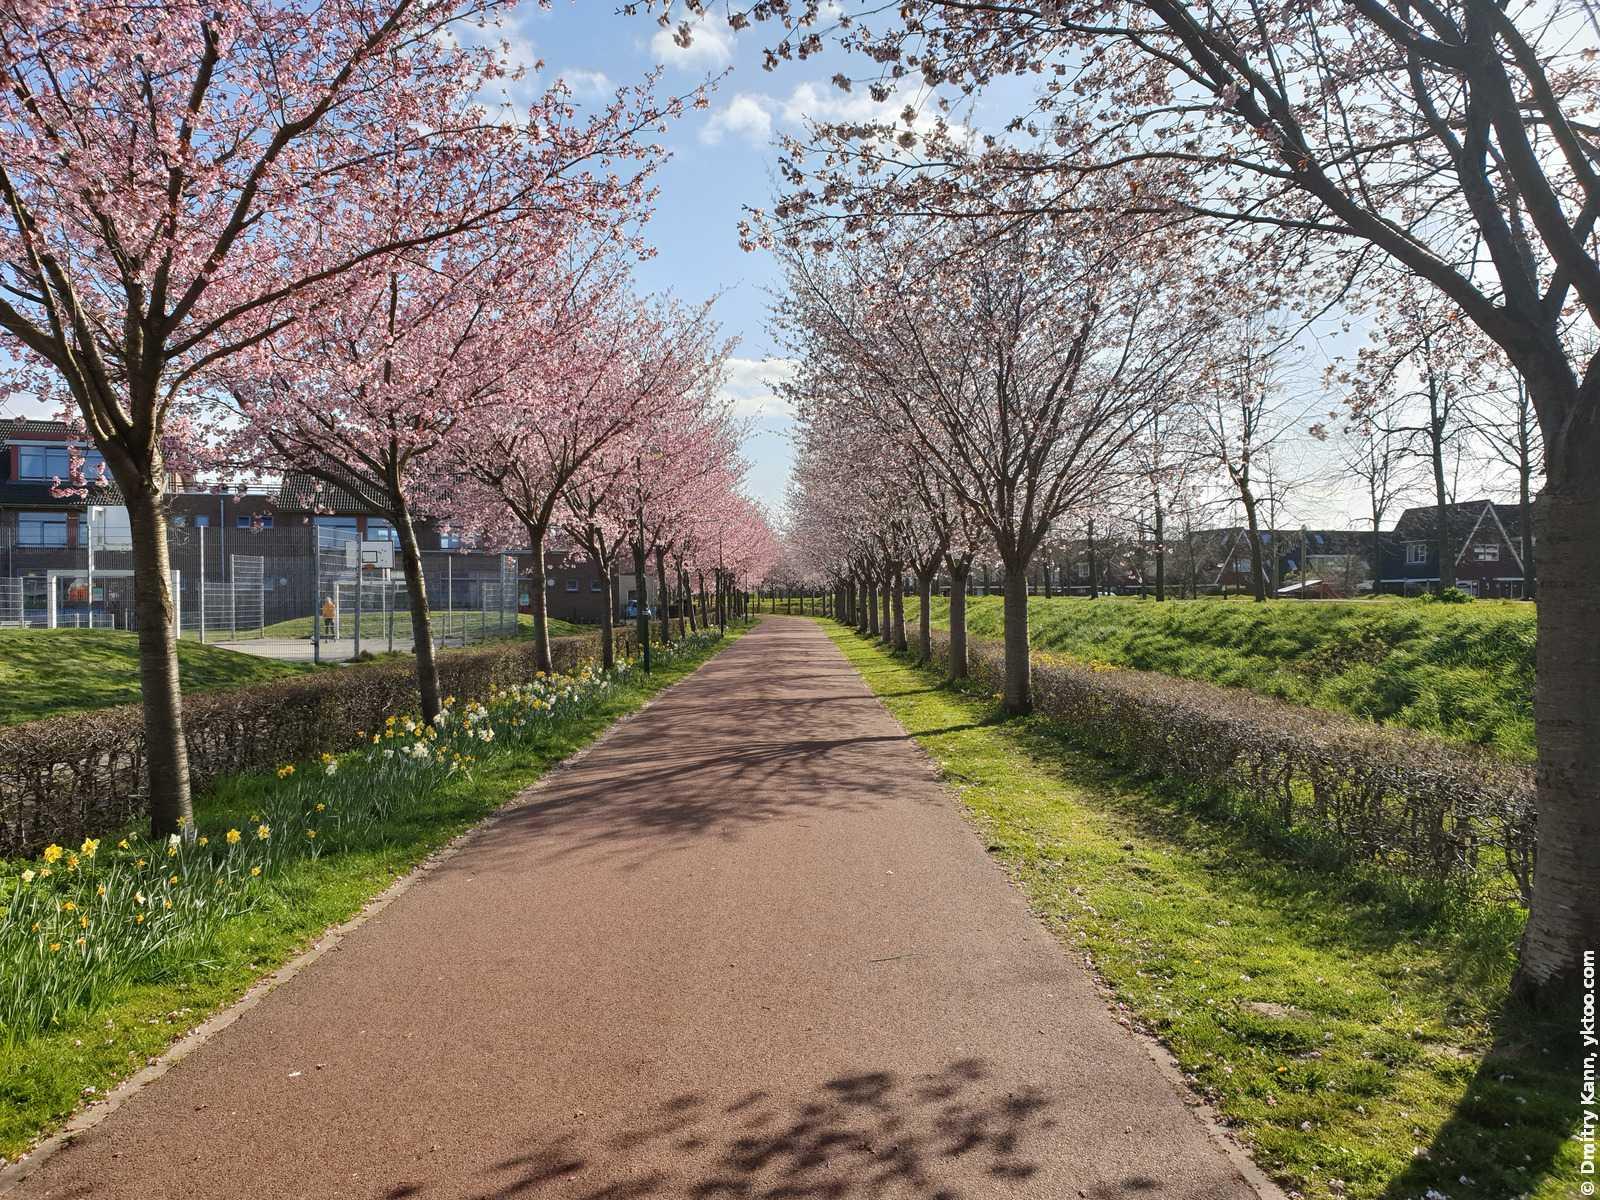 Spring in Houten.